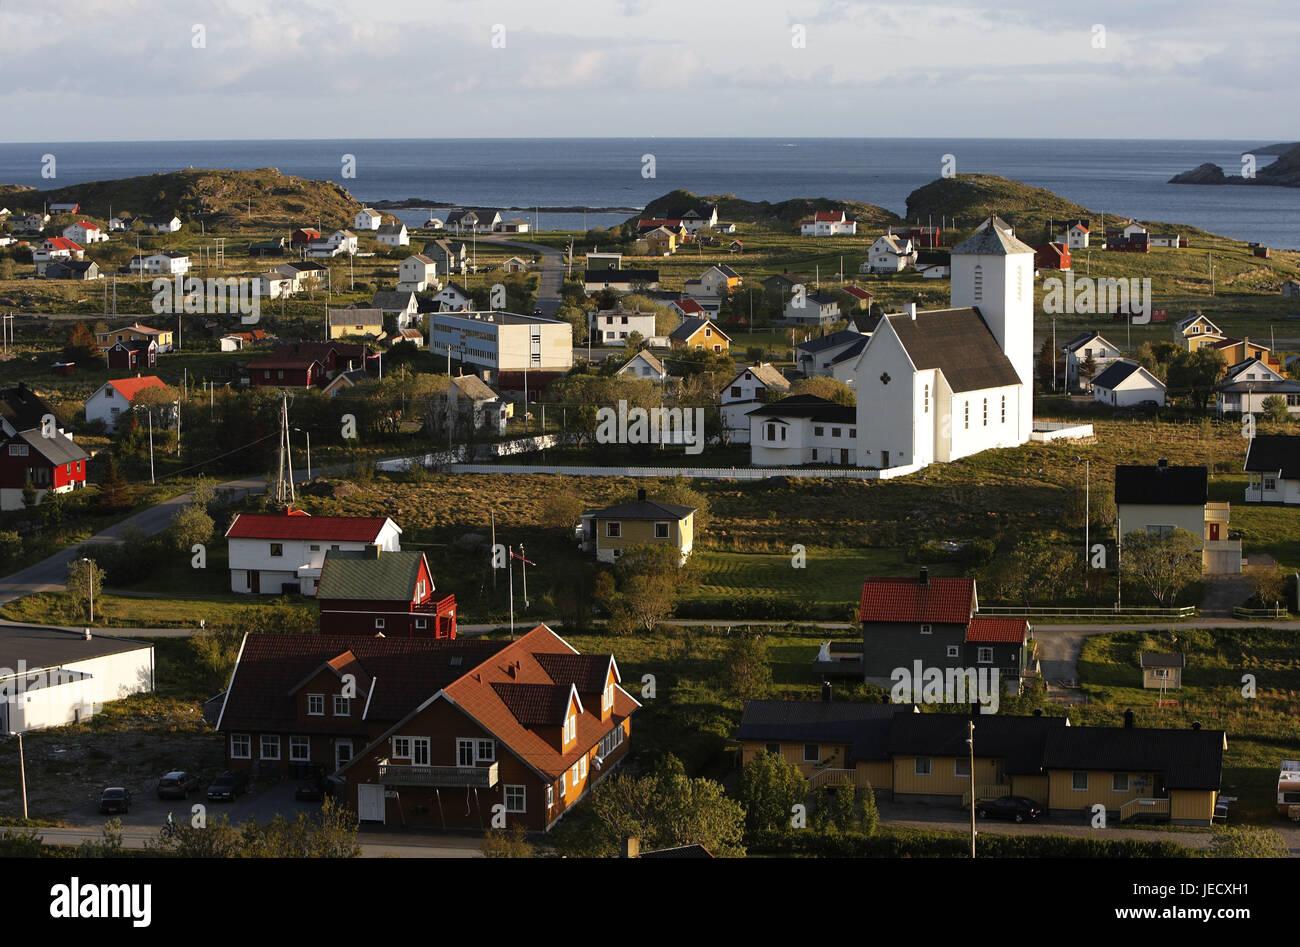 Sorland on the Lofoteninsel Vaeroy in Norway, - Stock Image